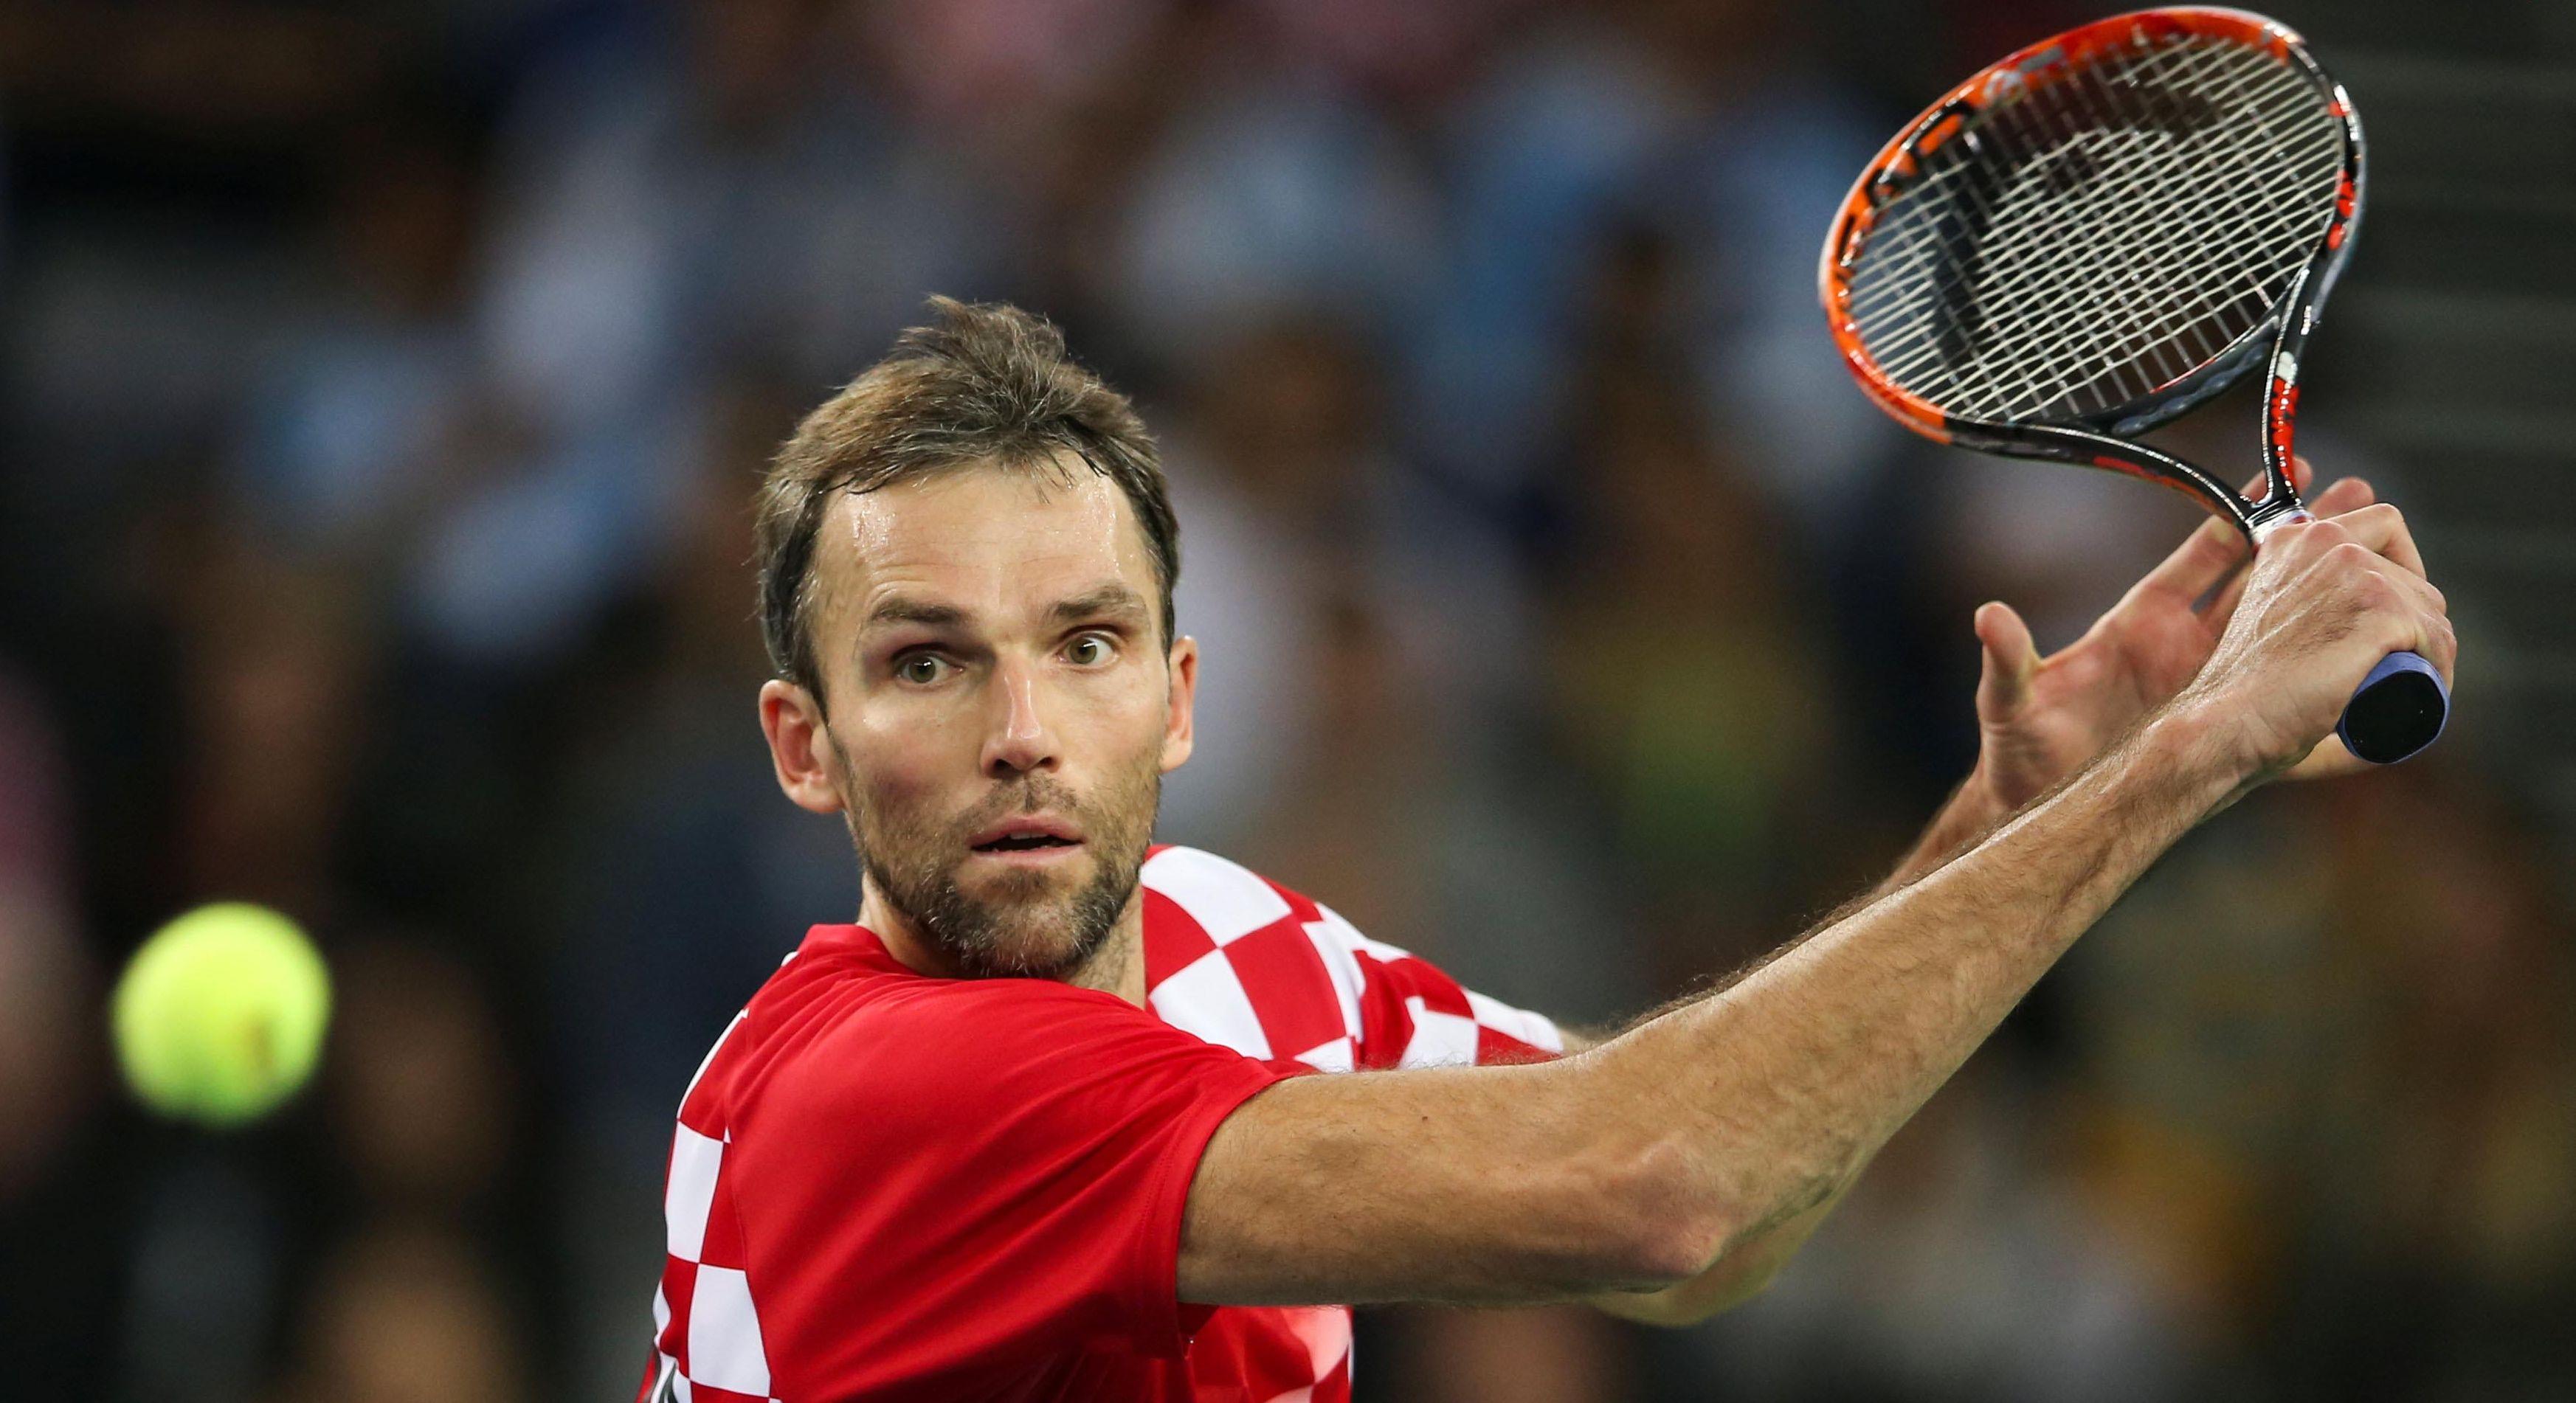 Tennis - Coupe Davis - Coupe Davis : Karlovic-Delbonis en direct